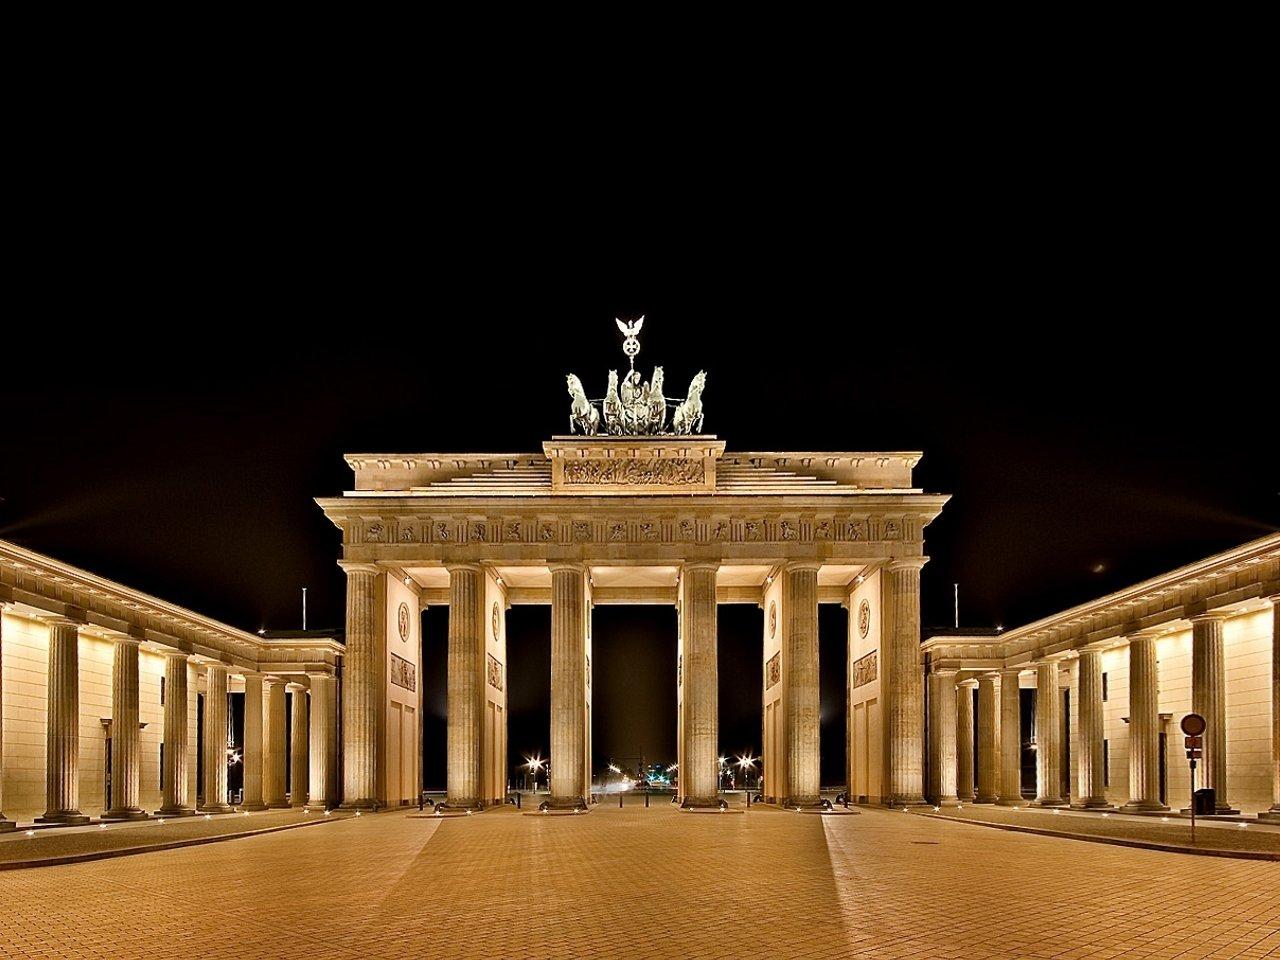 Poarta Brandenbung, simbolul istoriei Europei